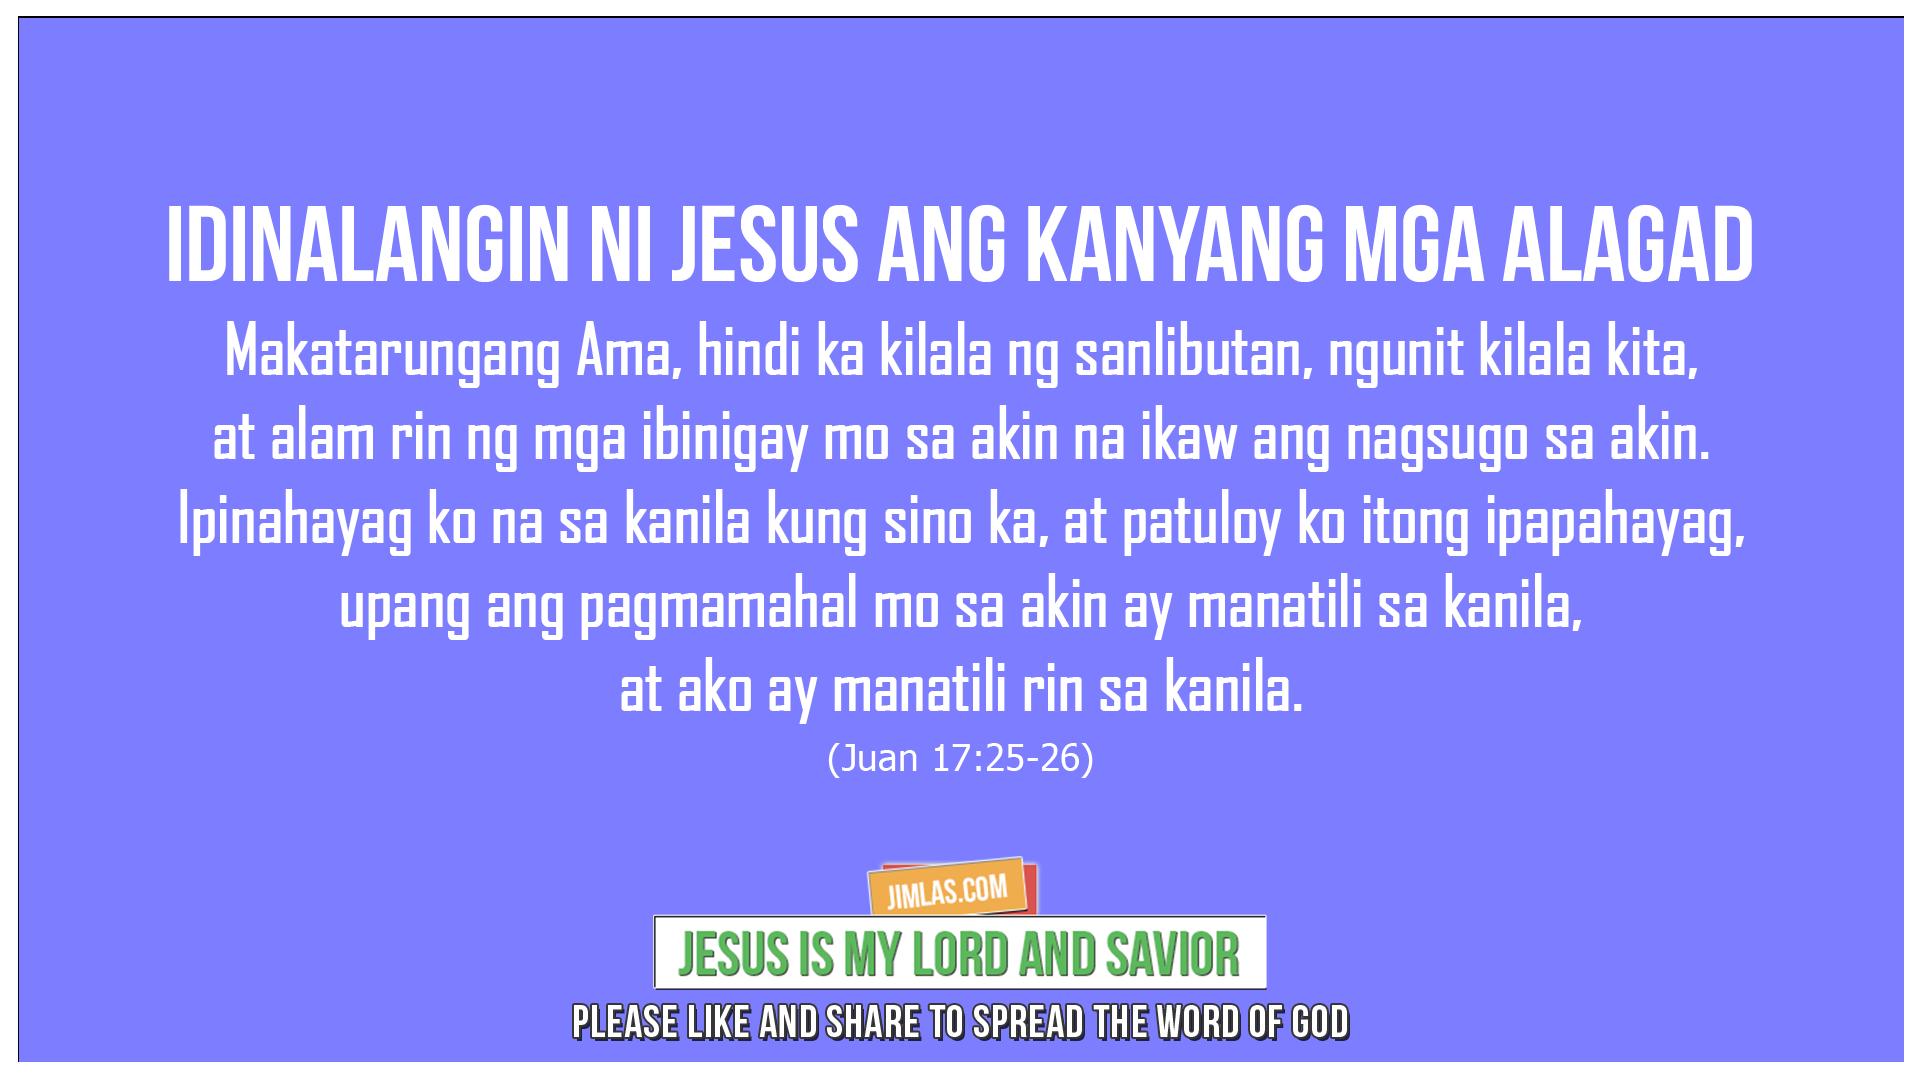 Juan 17:25-26, Juan 17:25-26